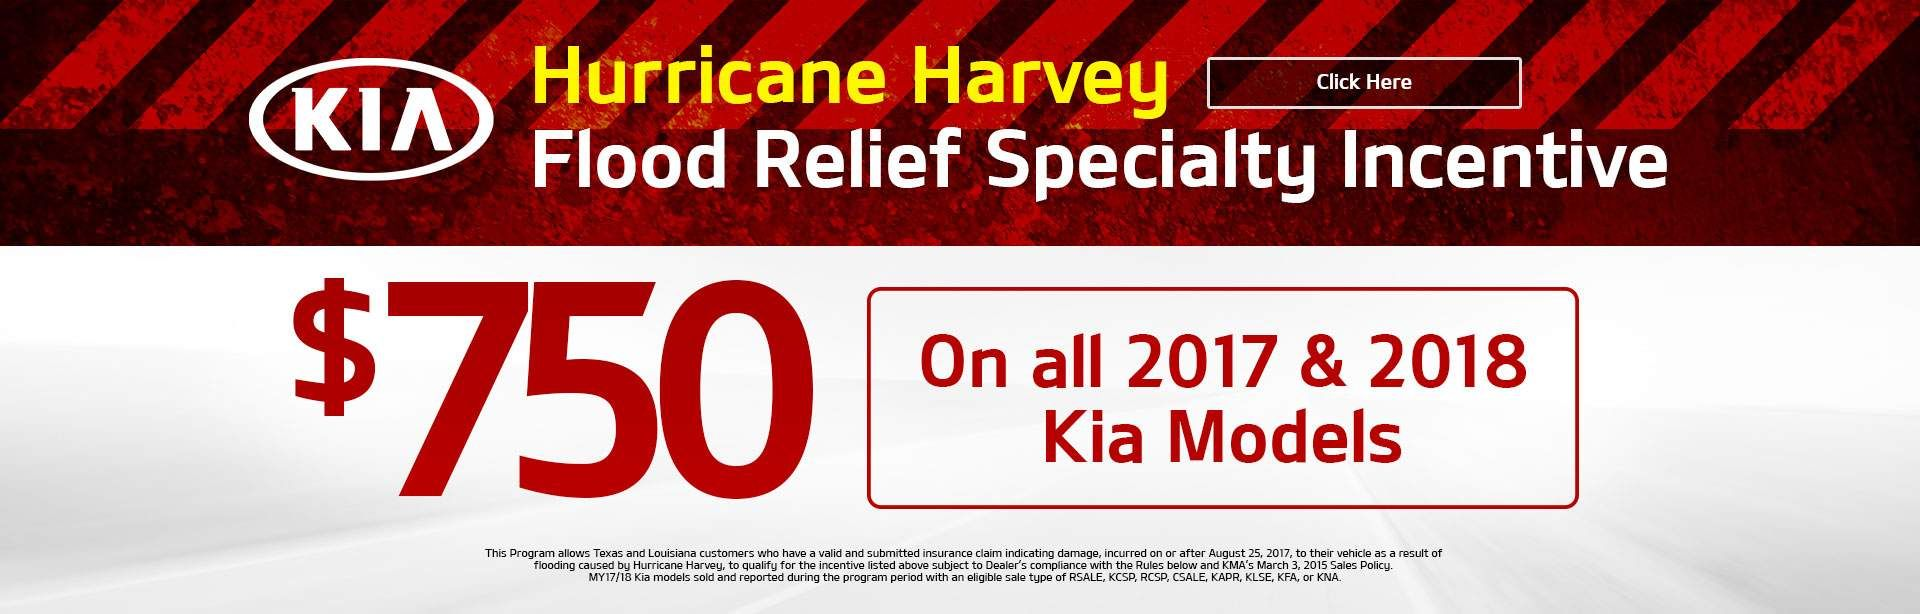 Hurrican harvey